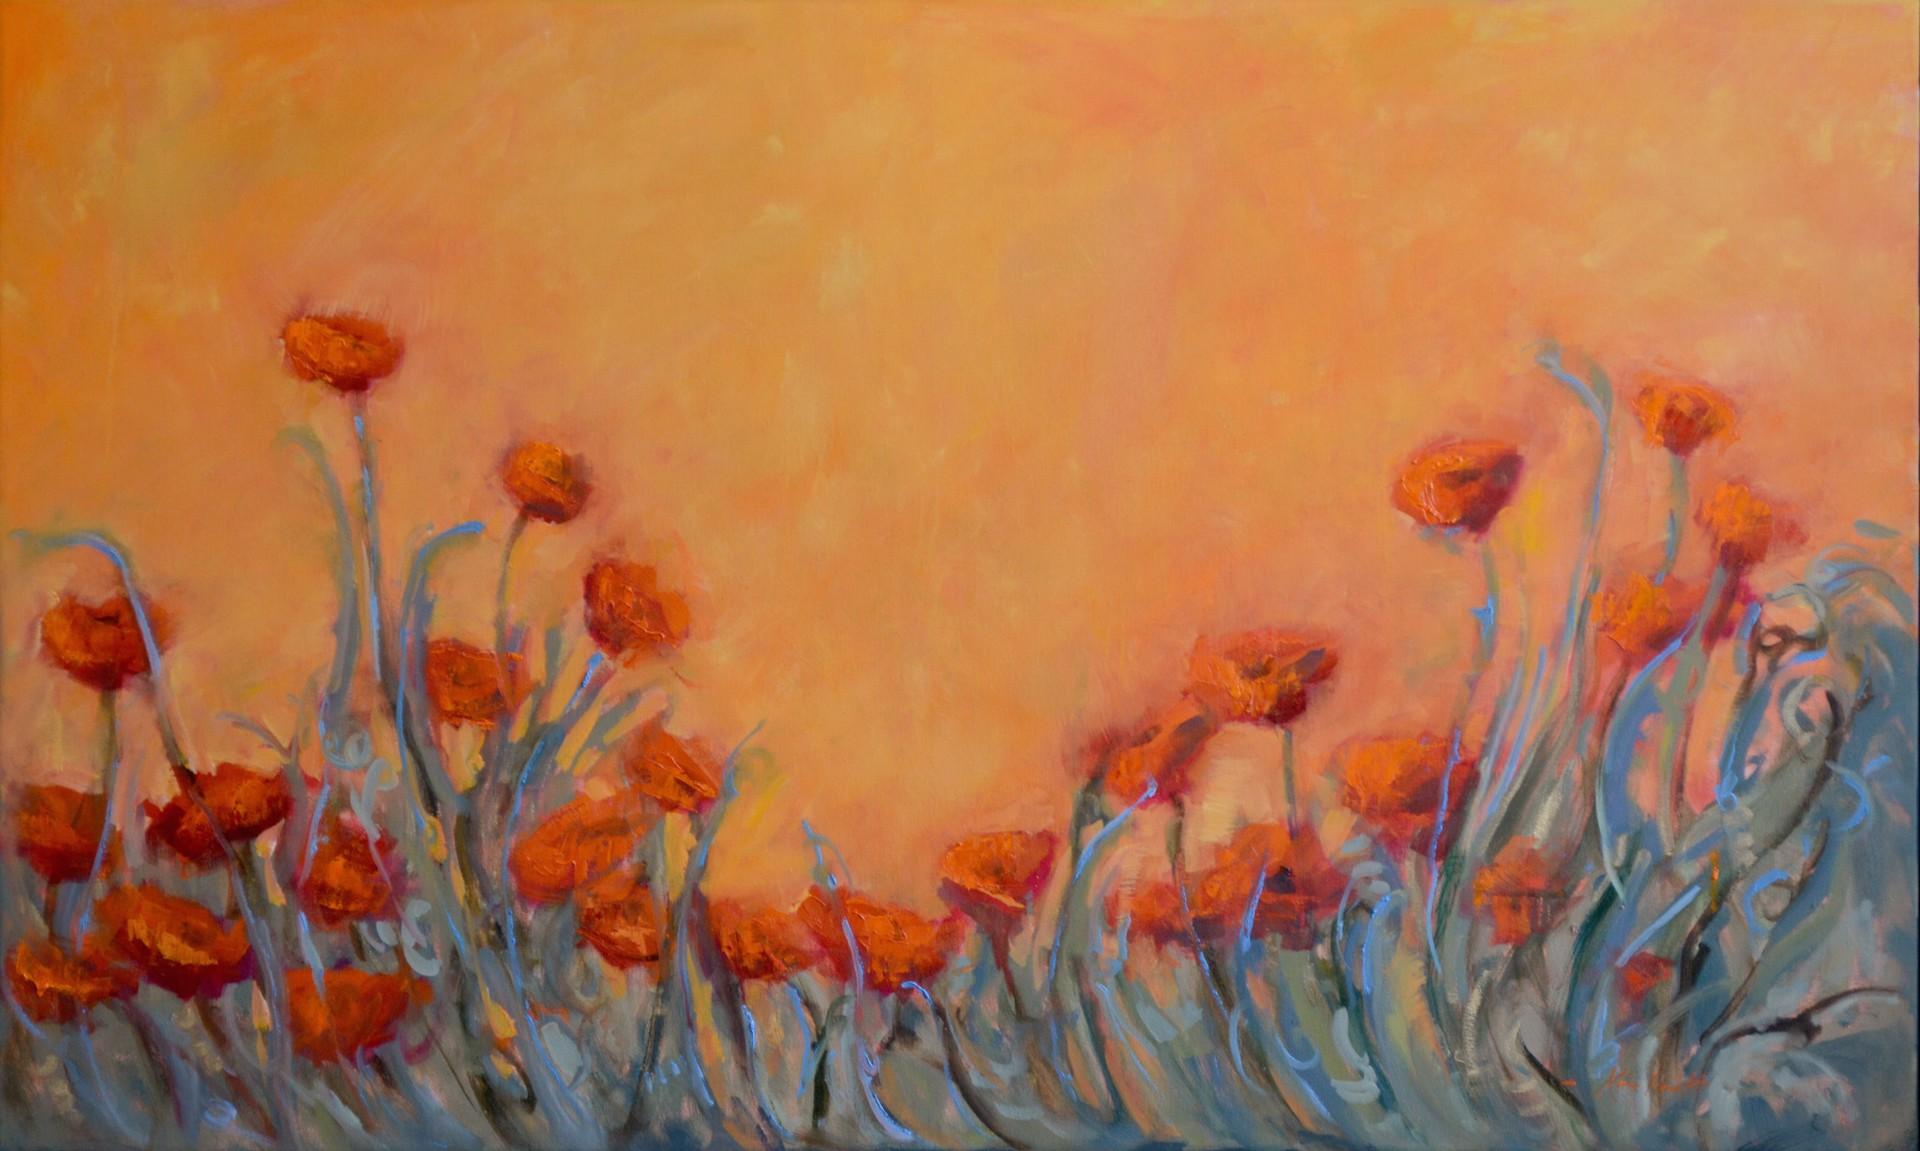 Italian Poppies Rising by Karen Hewitt Hagan